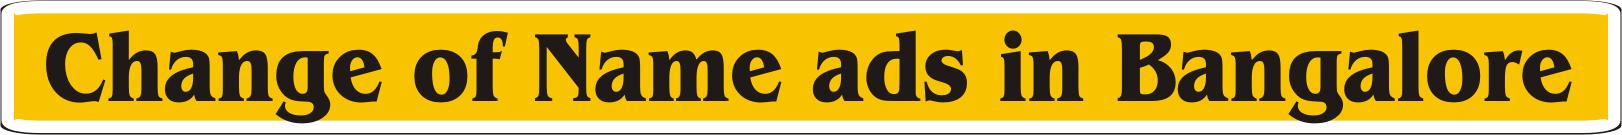 change of name ads bangalore